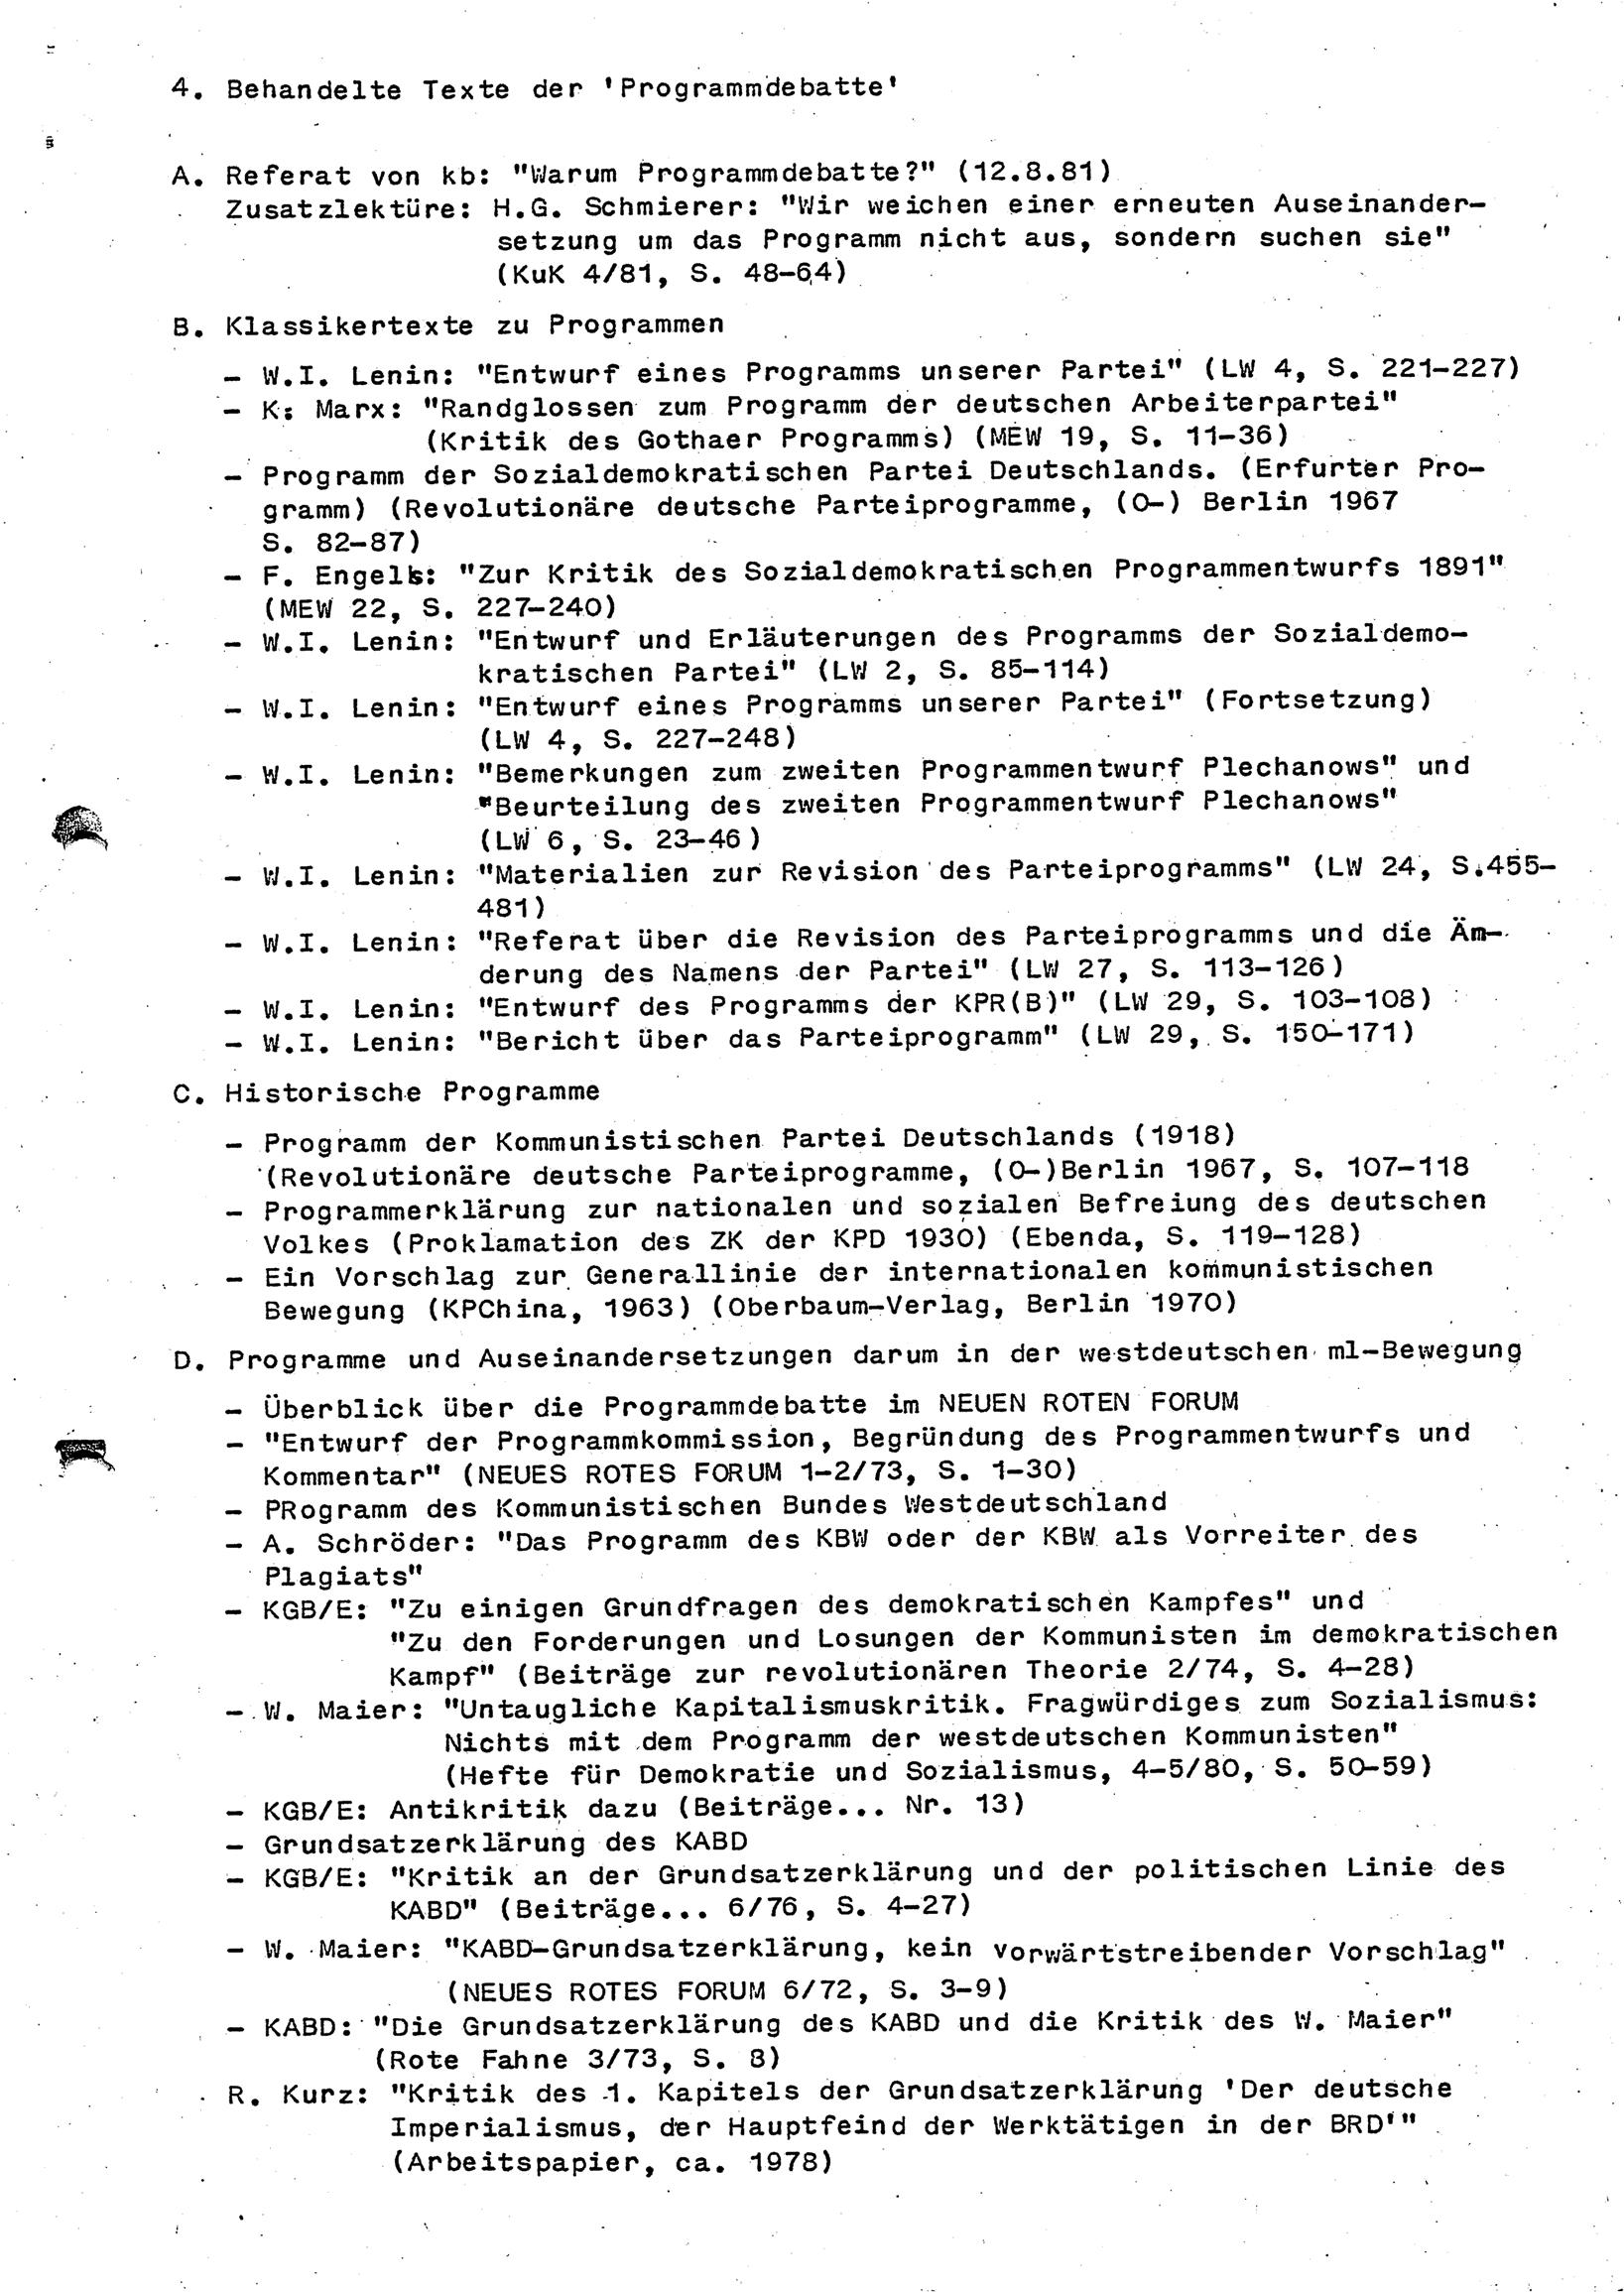 Ulm_KGU_Arbeitsheft_19830425_015_070